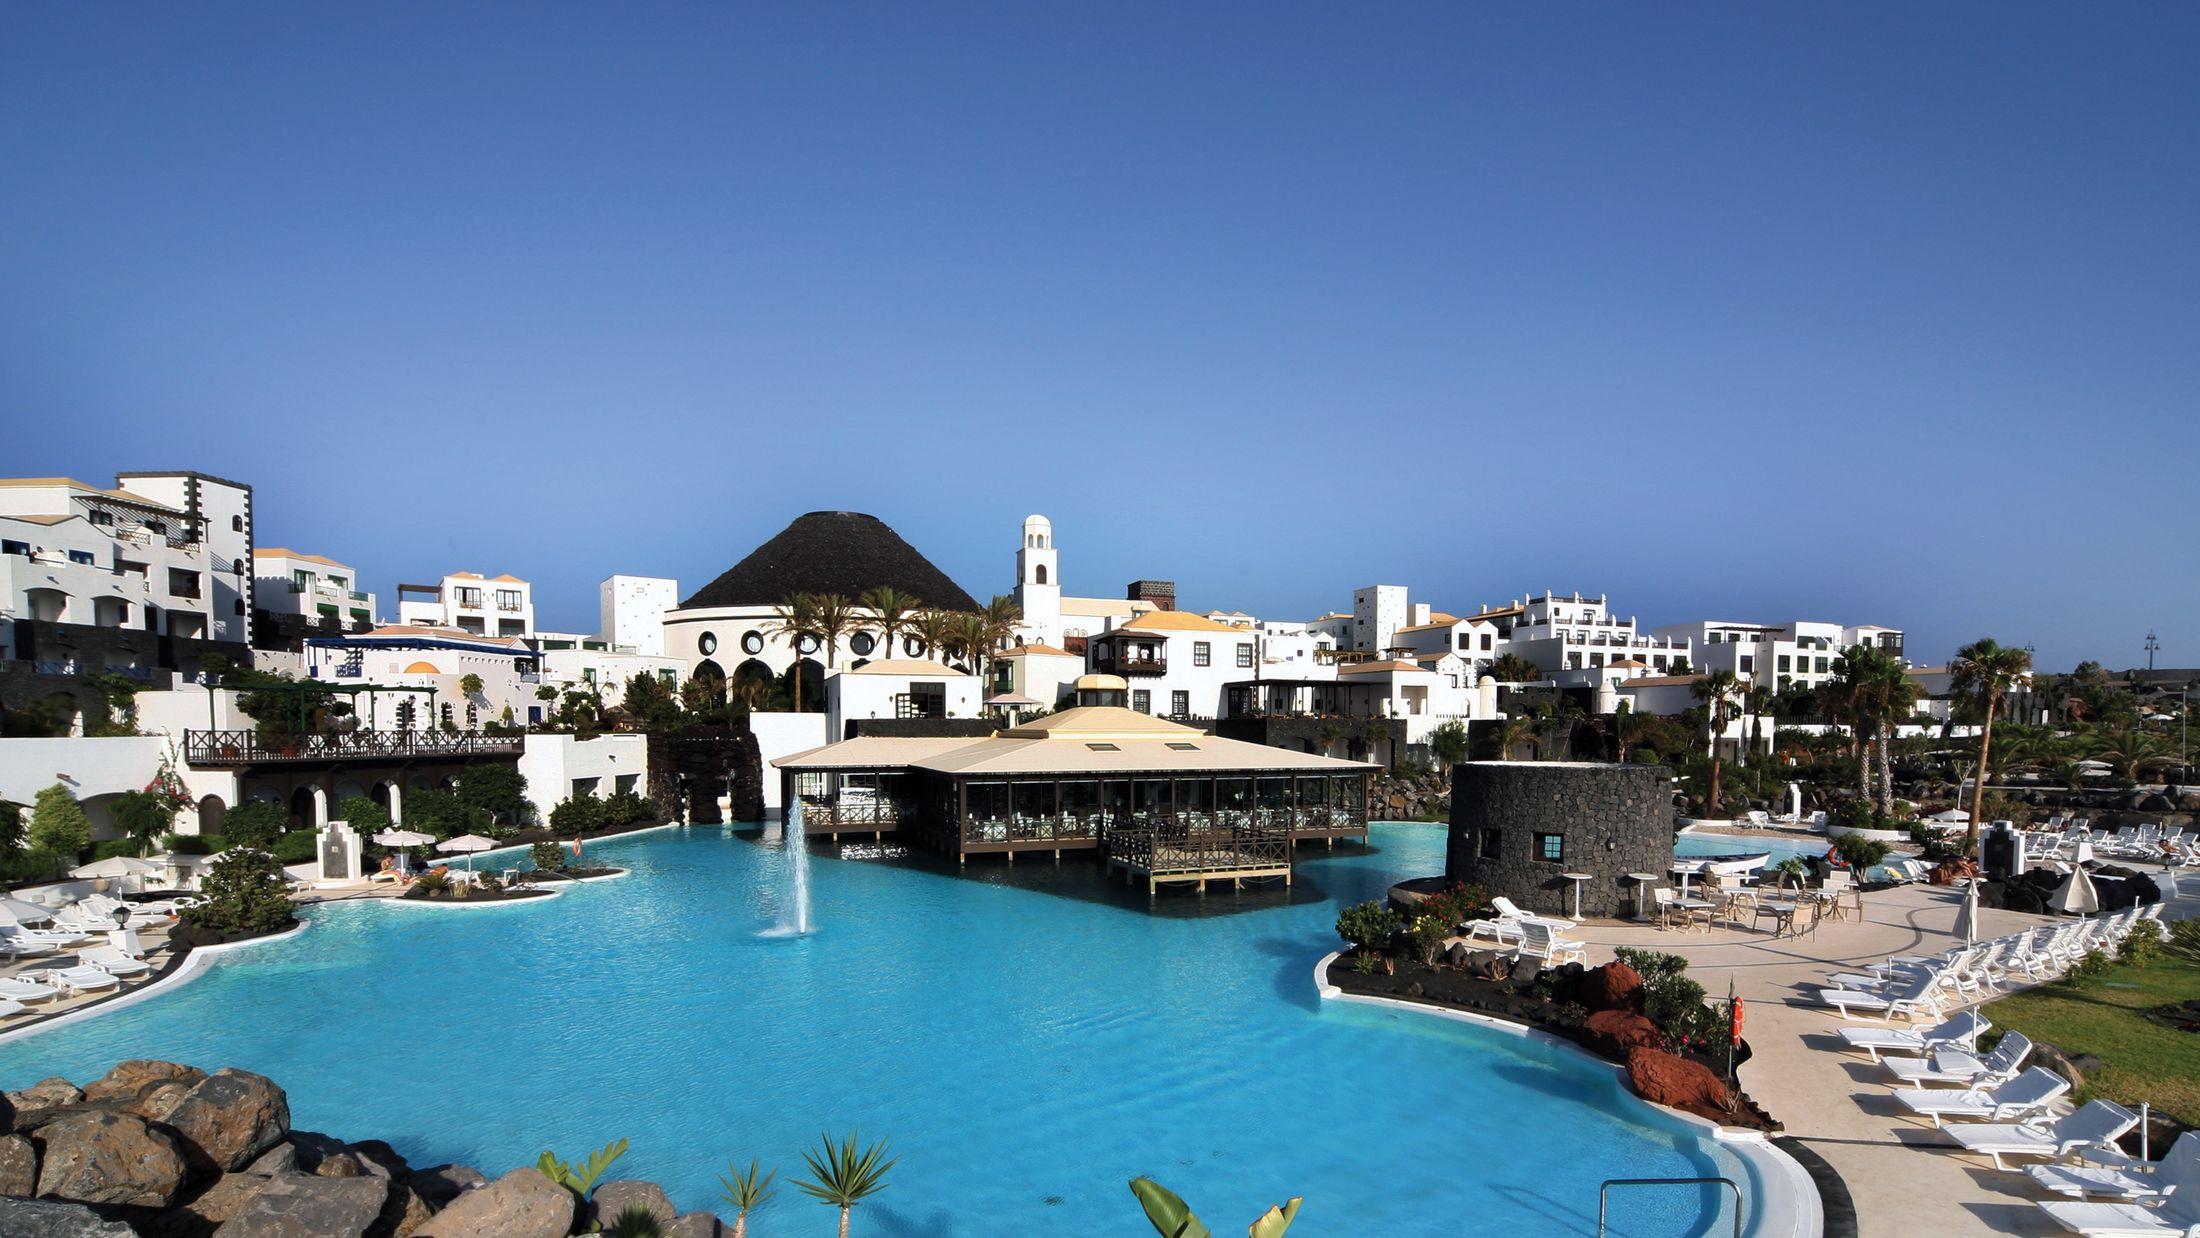 Luxury Lanzarote Holidays 2019 2020 Sovereign